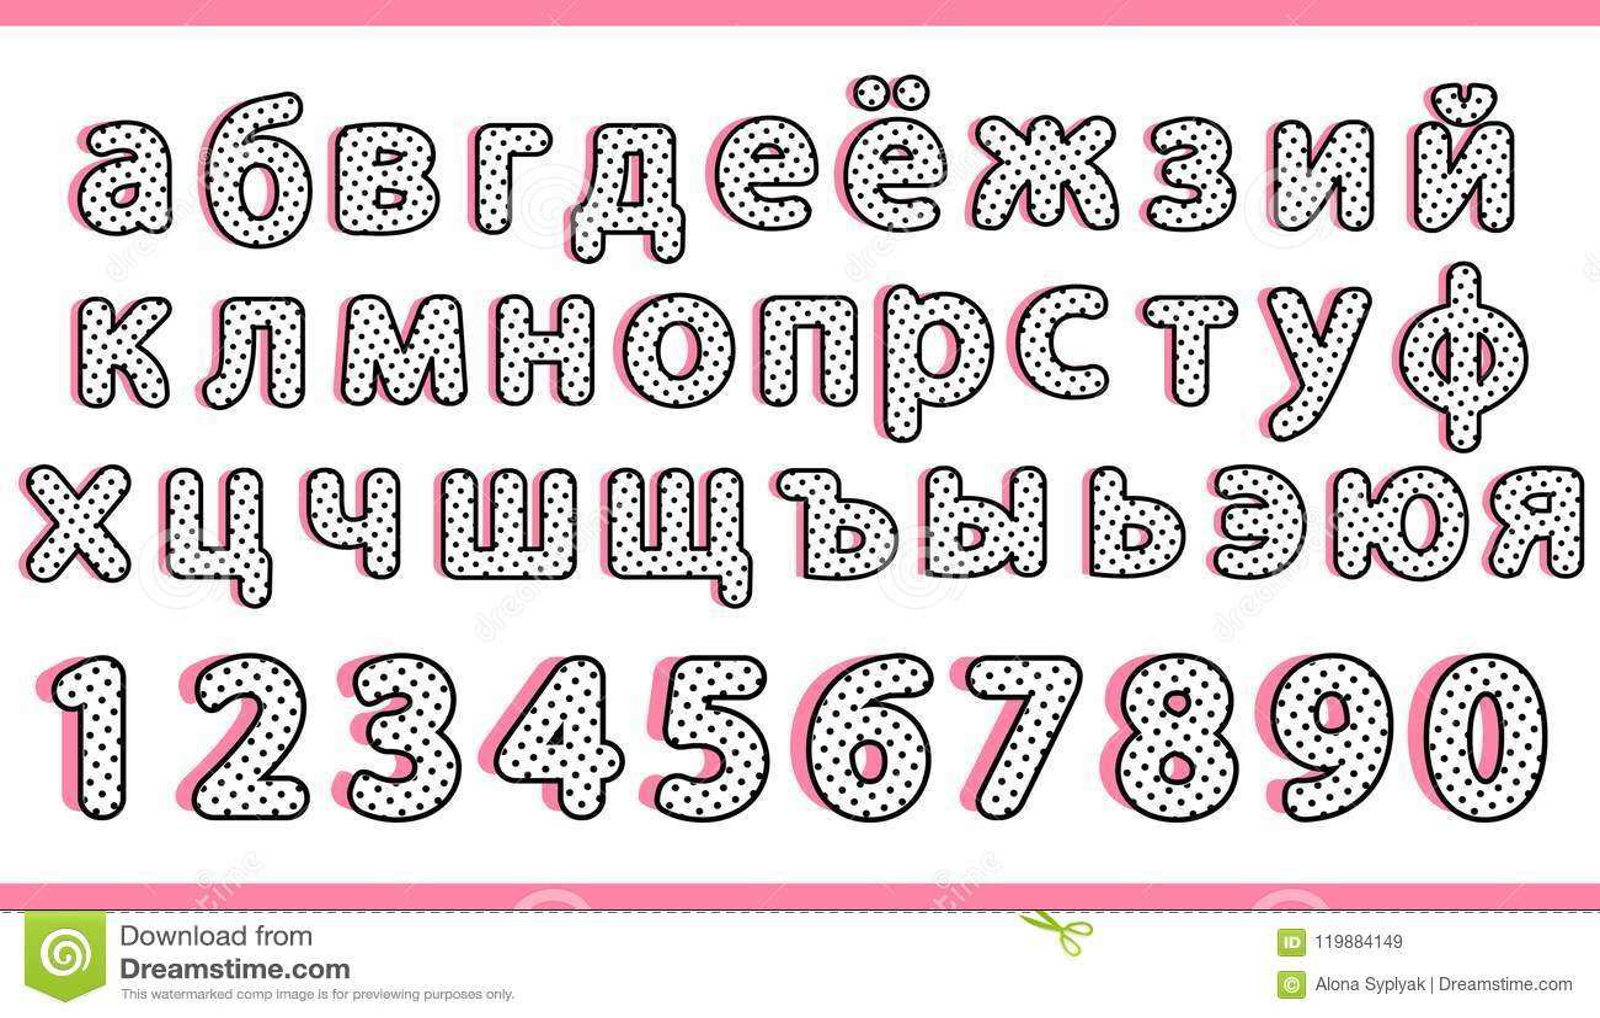 Cyrillic Russian Alphabet  Black Polka Dots Letters Set  Stock